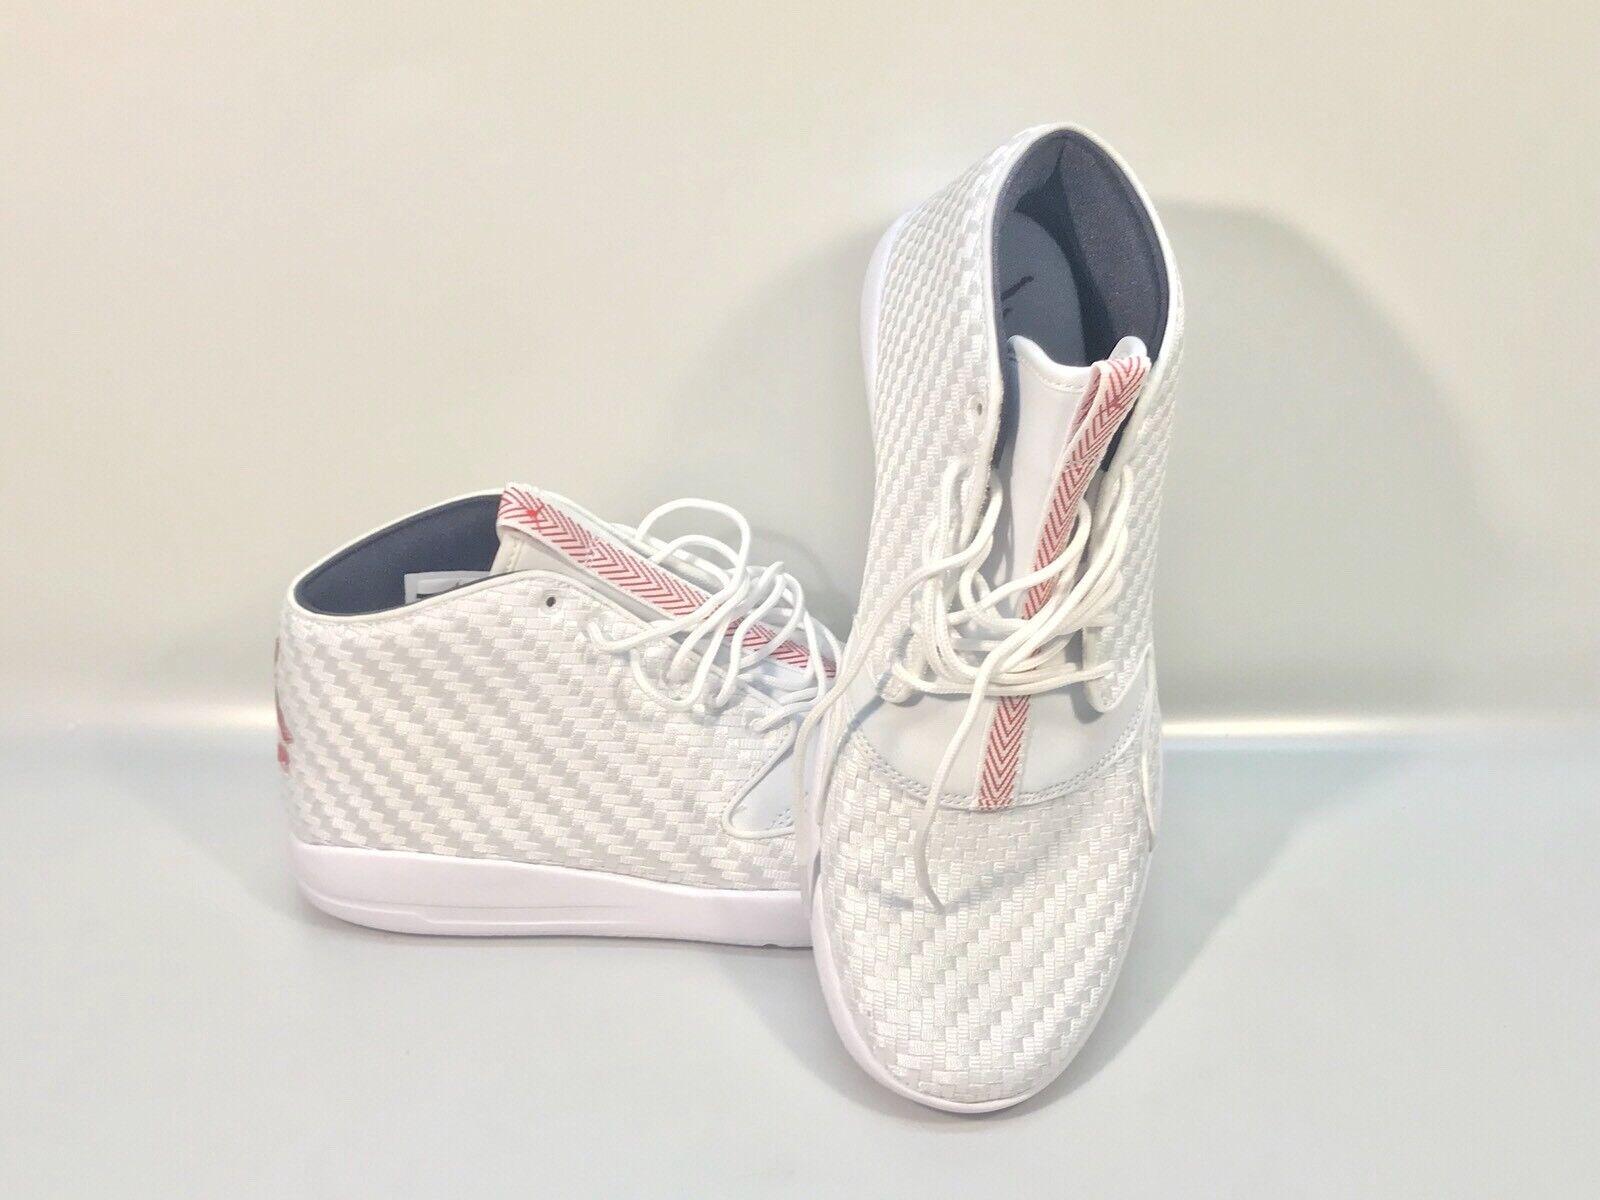 online retailer 3adc2 7a58a 1801 Nike Air VaporMax Flyknit Men s Men s Men s Training Running Shoes  849558-022 a4c70c ...